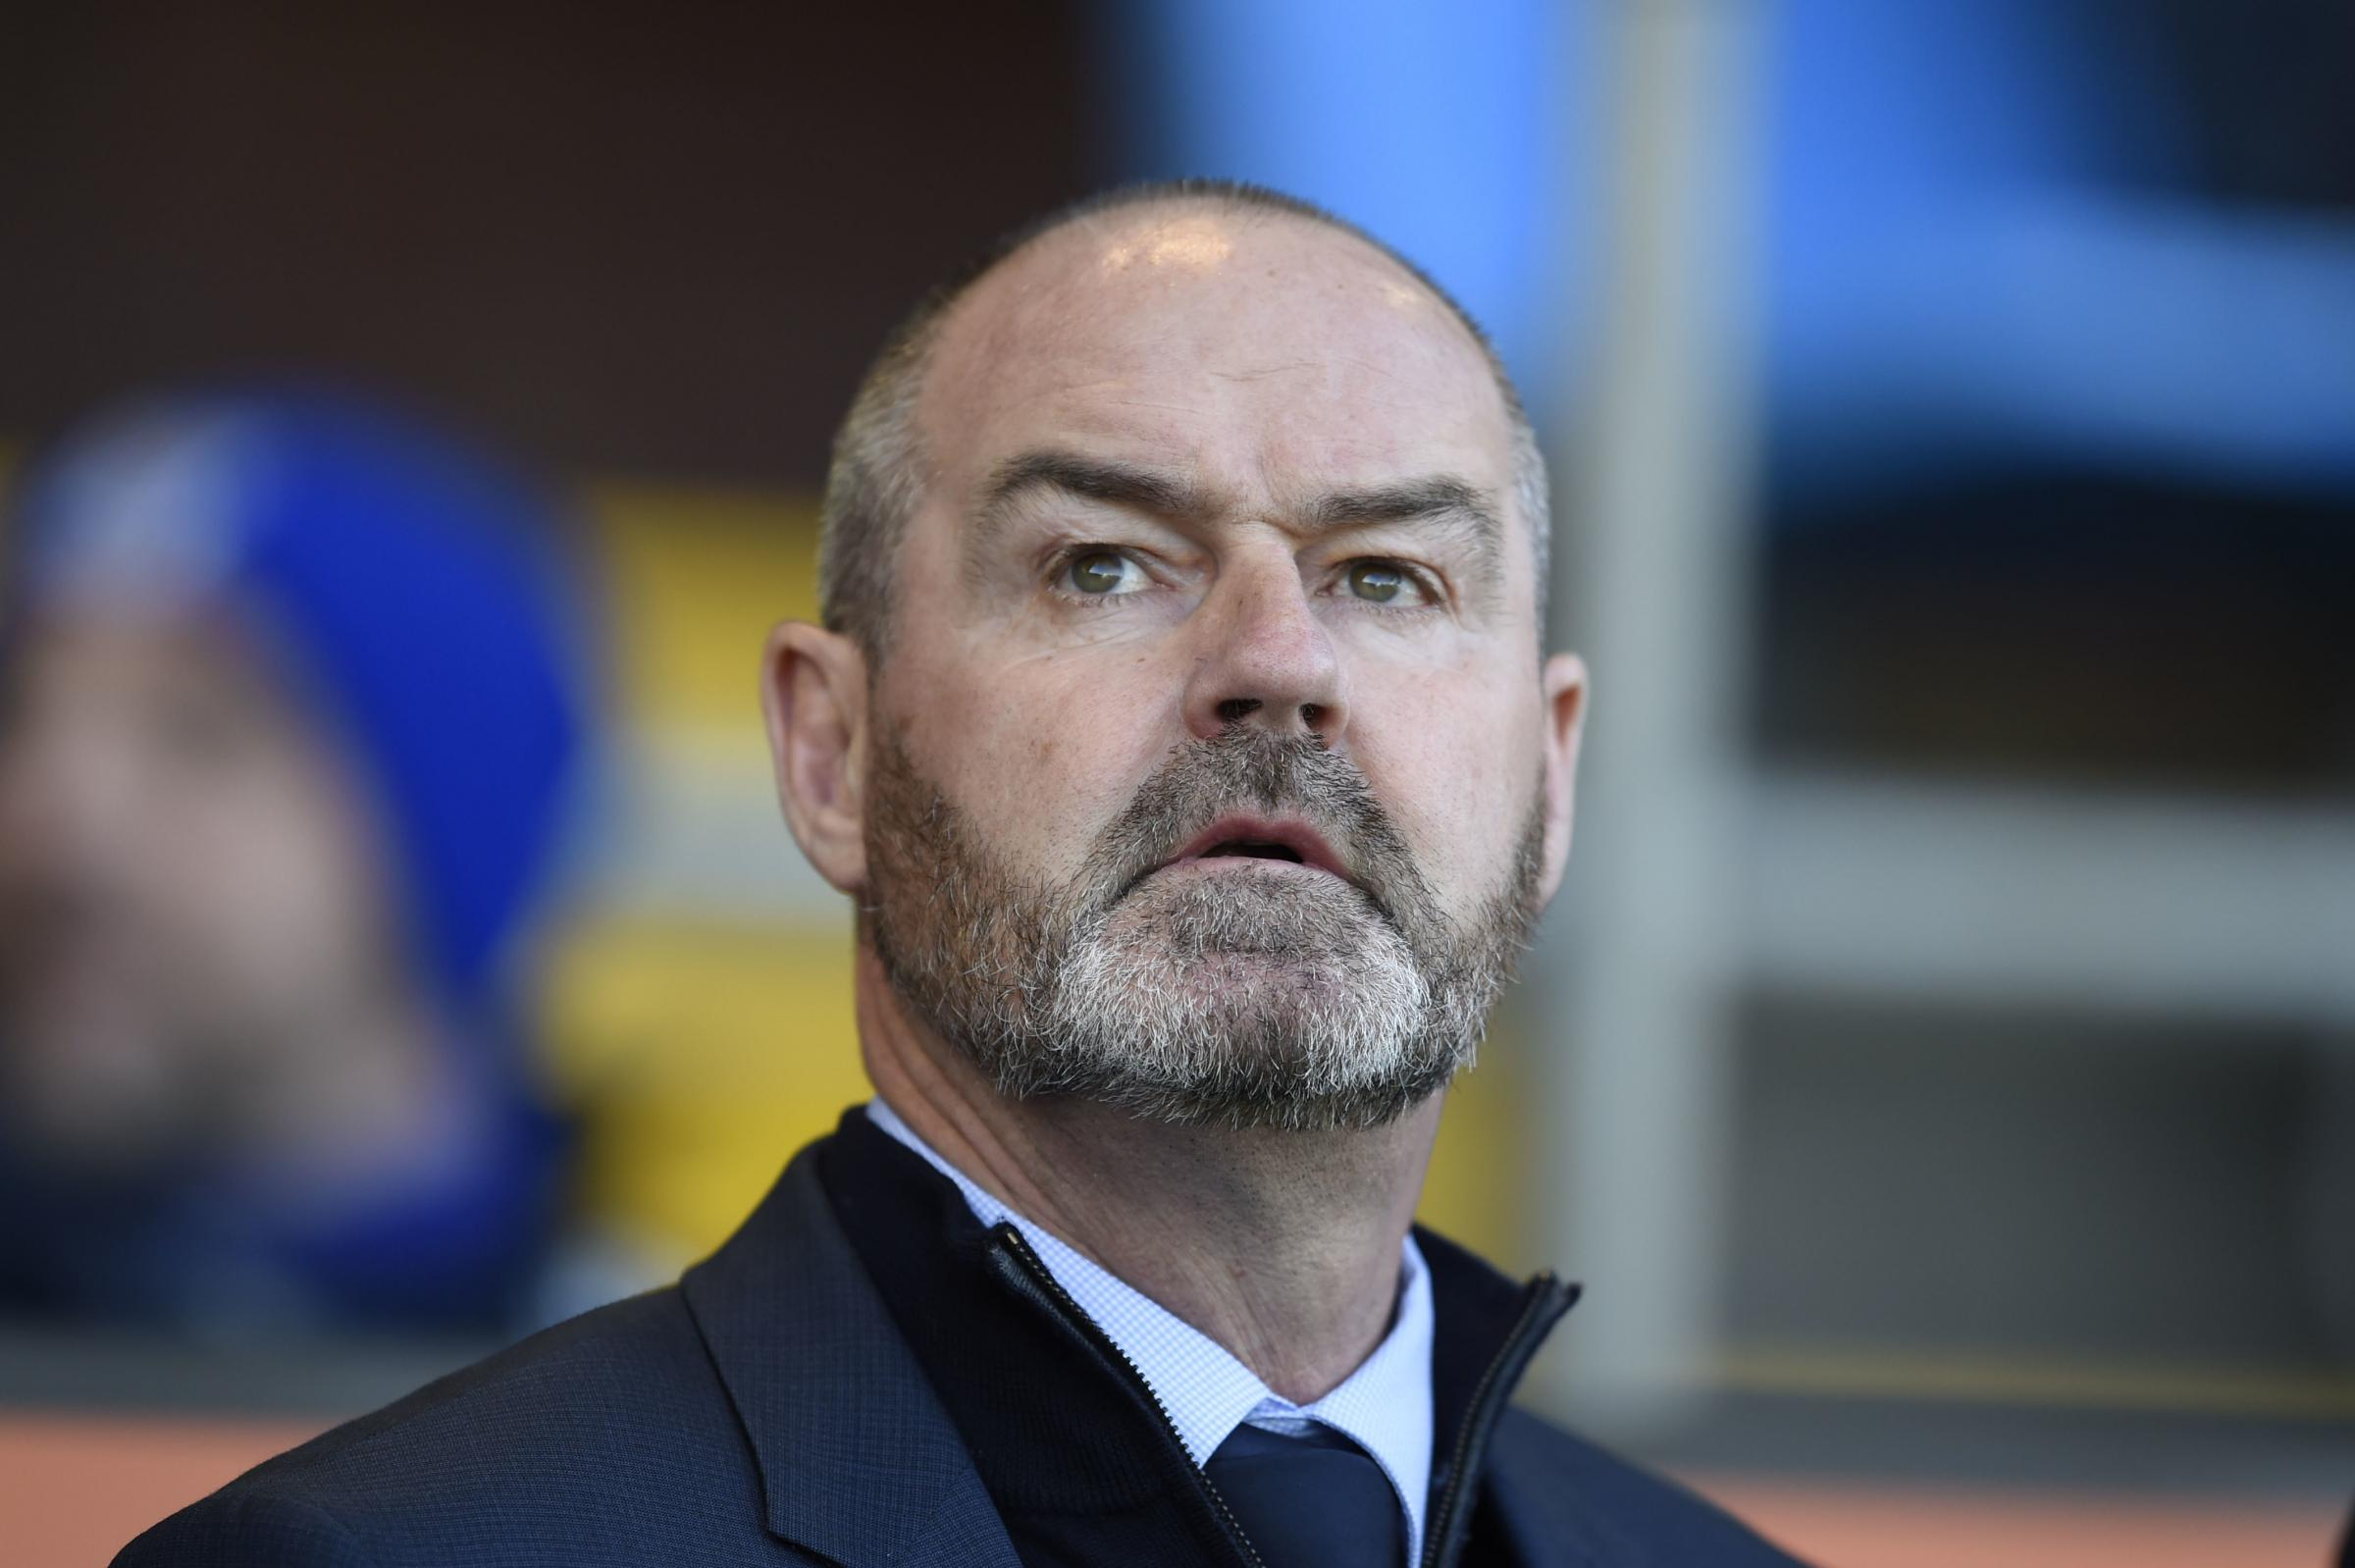 Kilmarnock manager Steve Clarke wants to talk about football not misbehaving fans